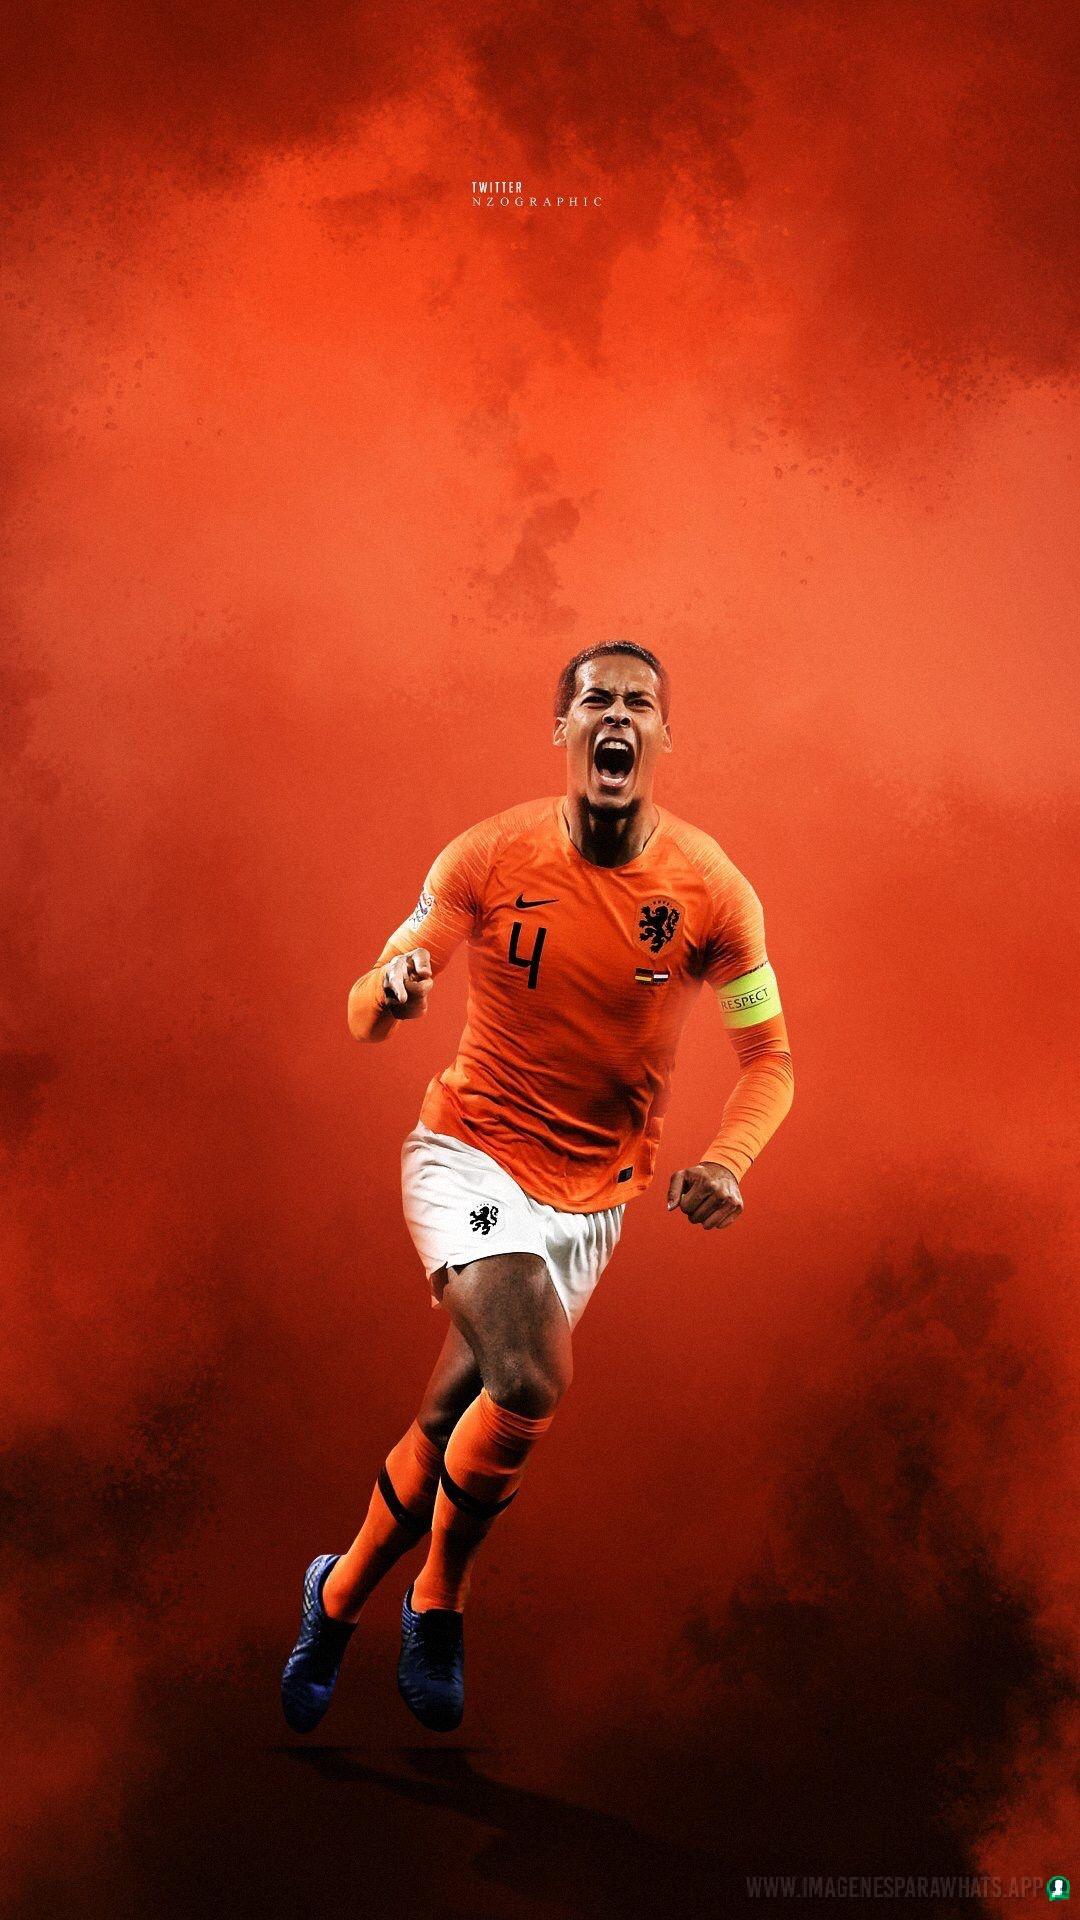 Imagenes de Futbol (1305)